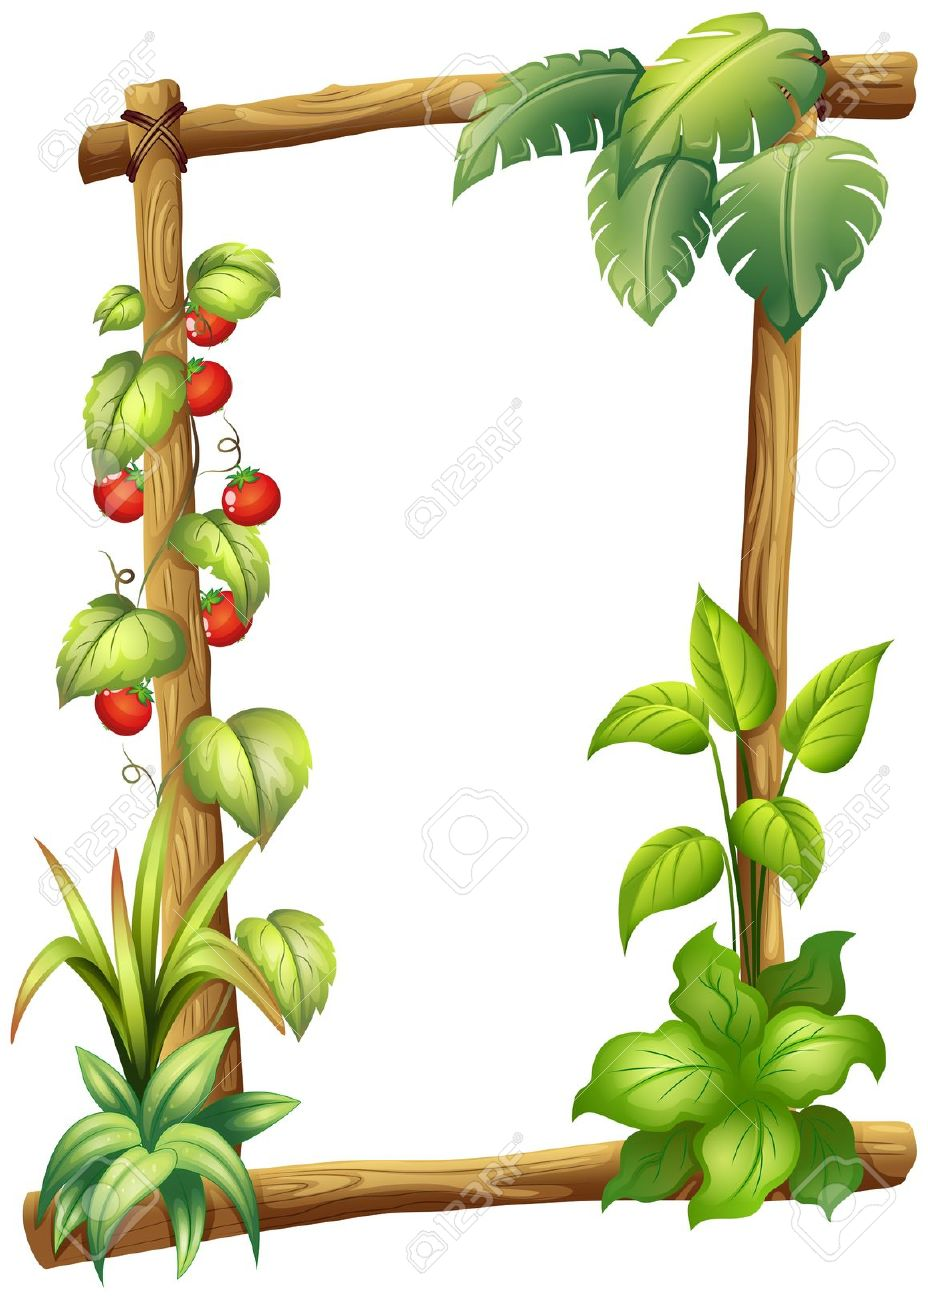 Border plant clipart clipground - Marcos para plantas ...